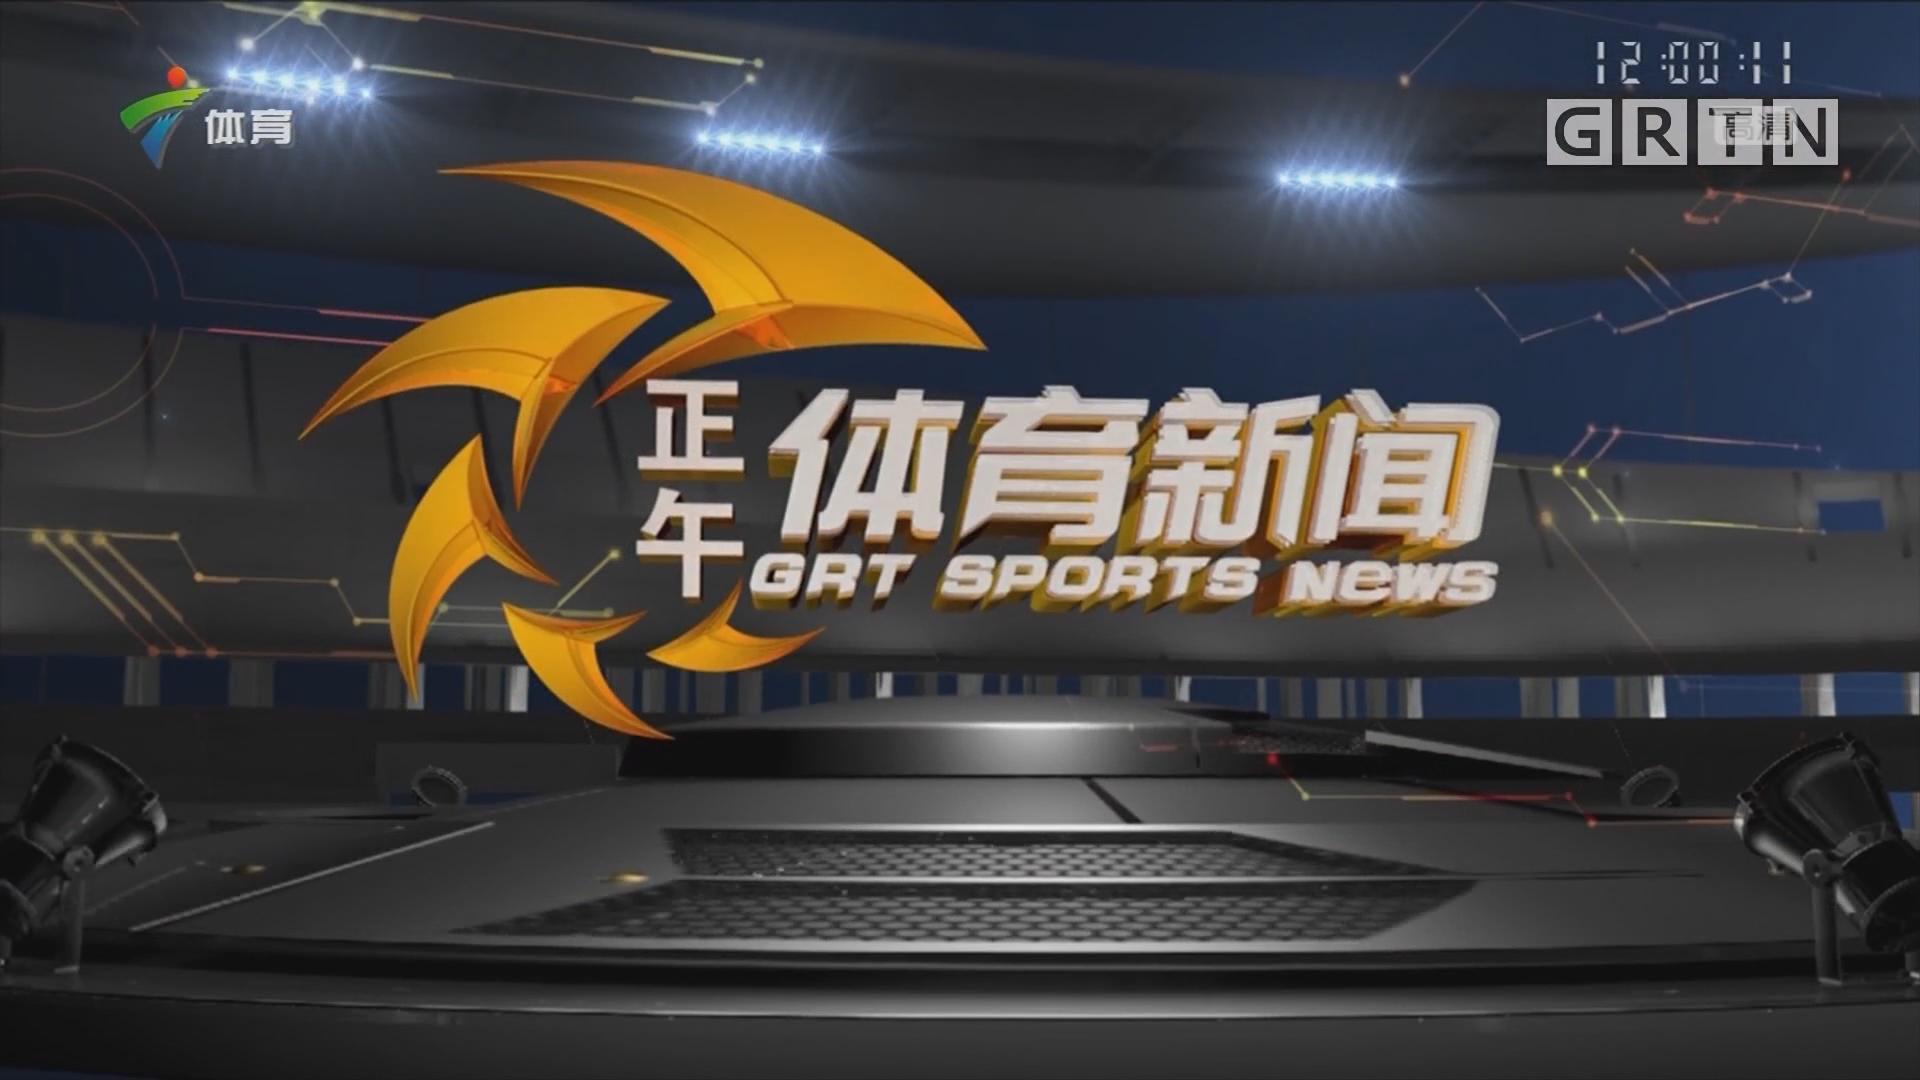 [HD][2018-11-25]正午体育新闻:C罗、曼朱基奇破门 尤文完胜斯帕尔